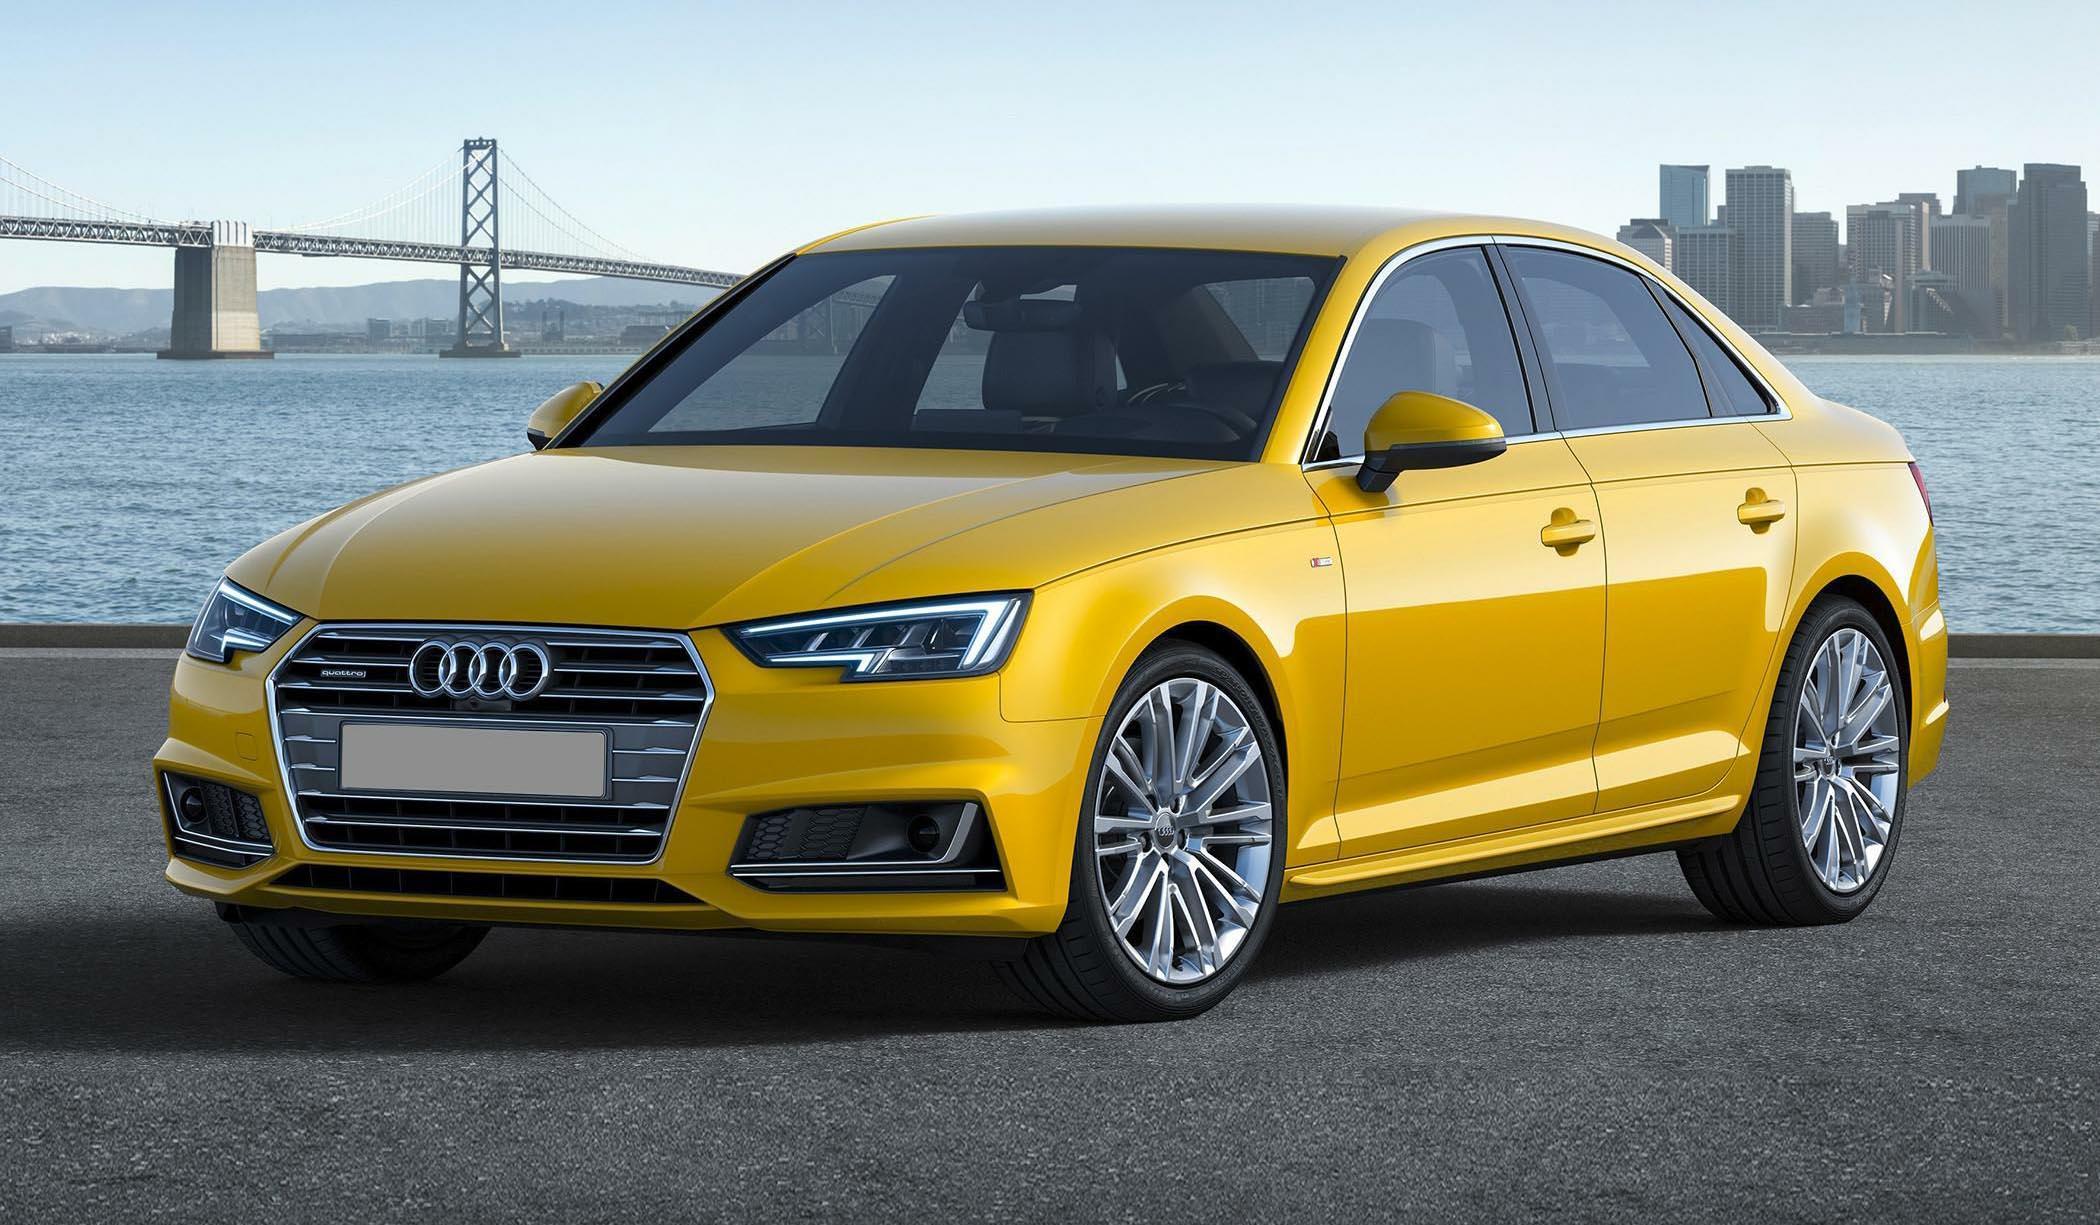 Audi A4 2 0 TDI B9 laptimes, specs, performance data